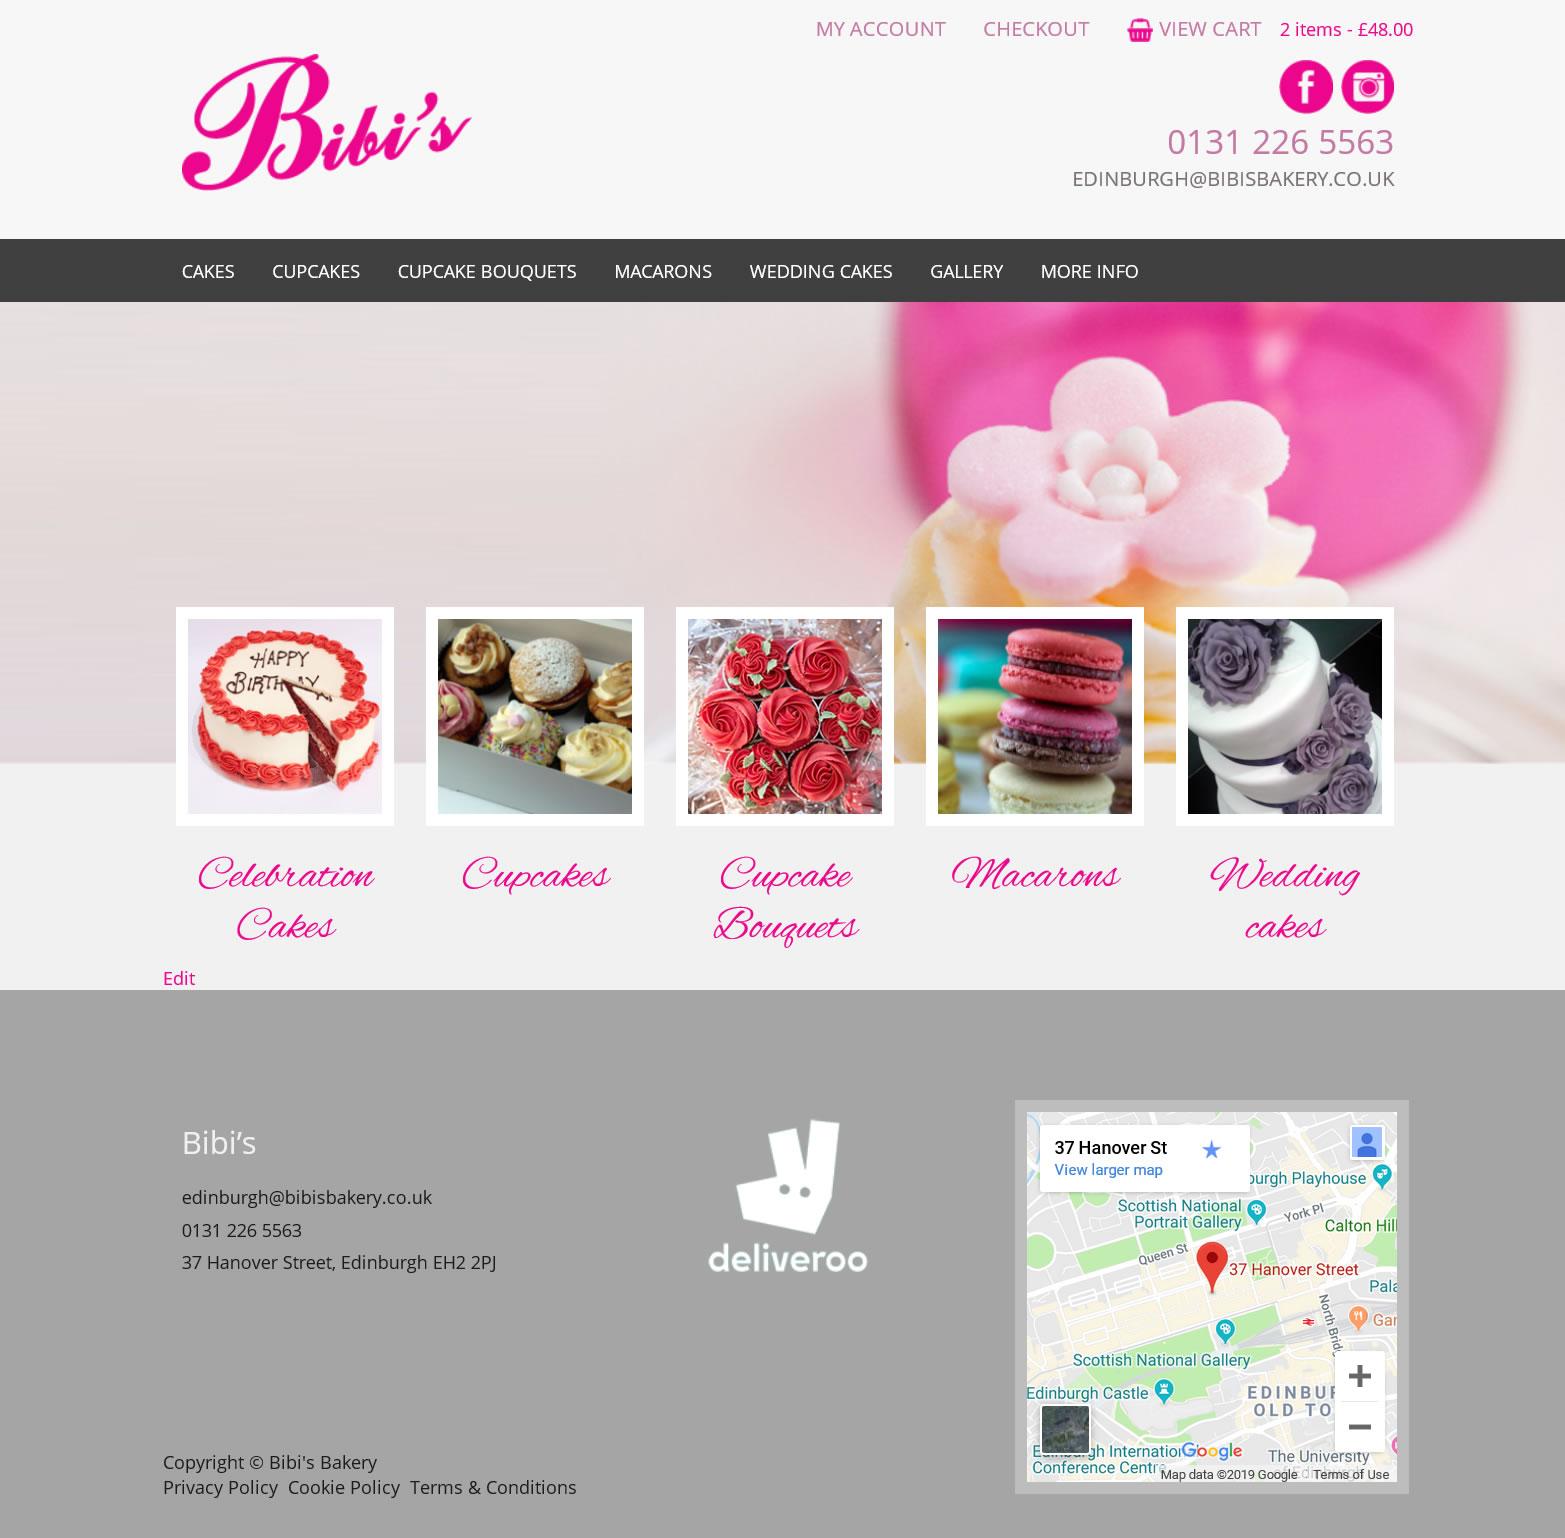 Bibis Bakery